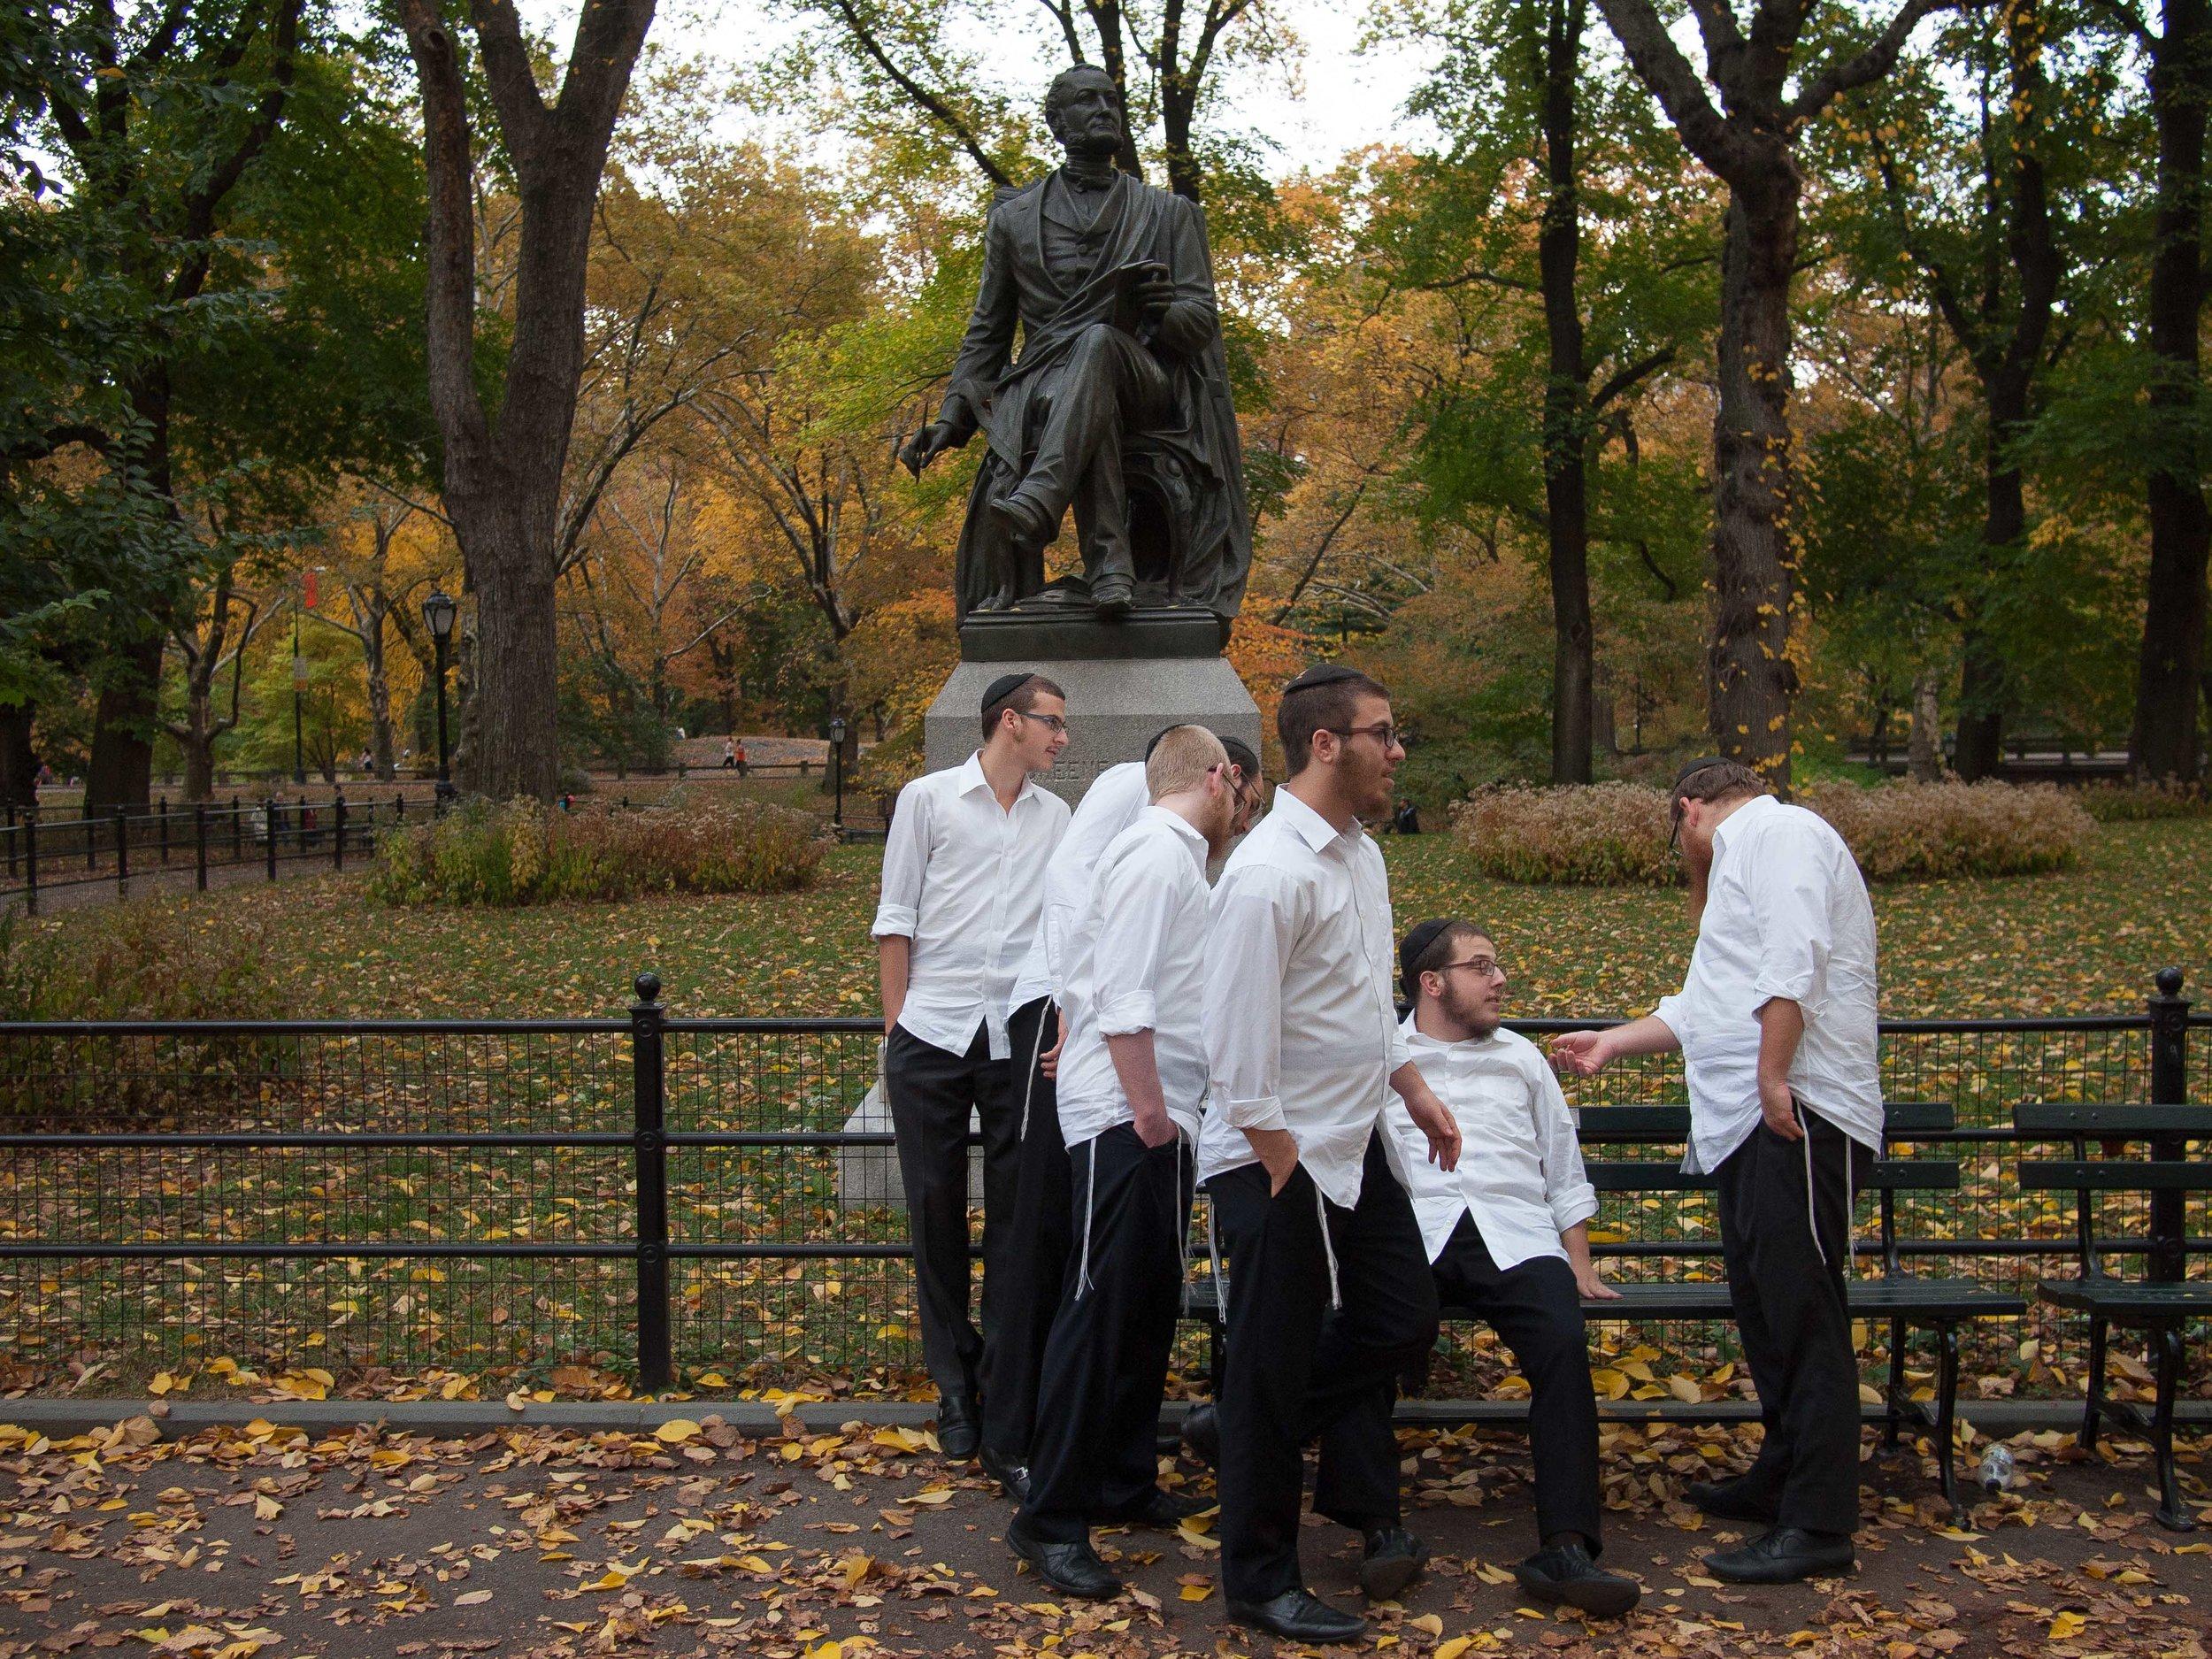 Fitz-Greene Halleck Statue, Poet's Walk, November 2013